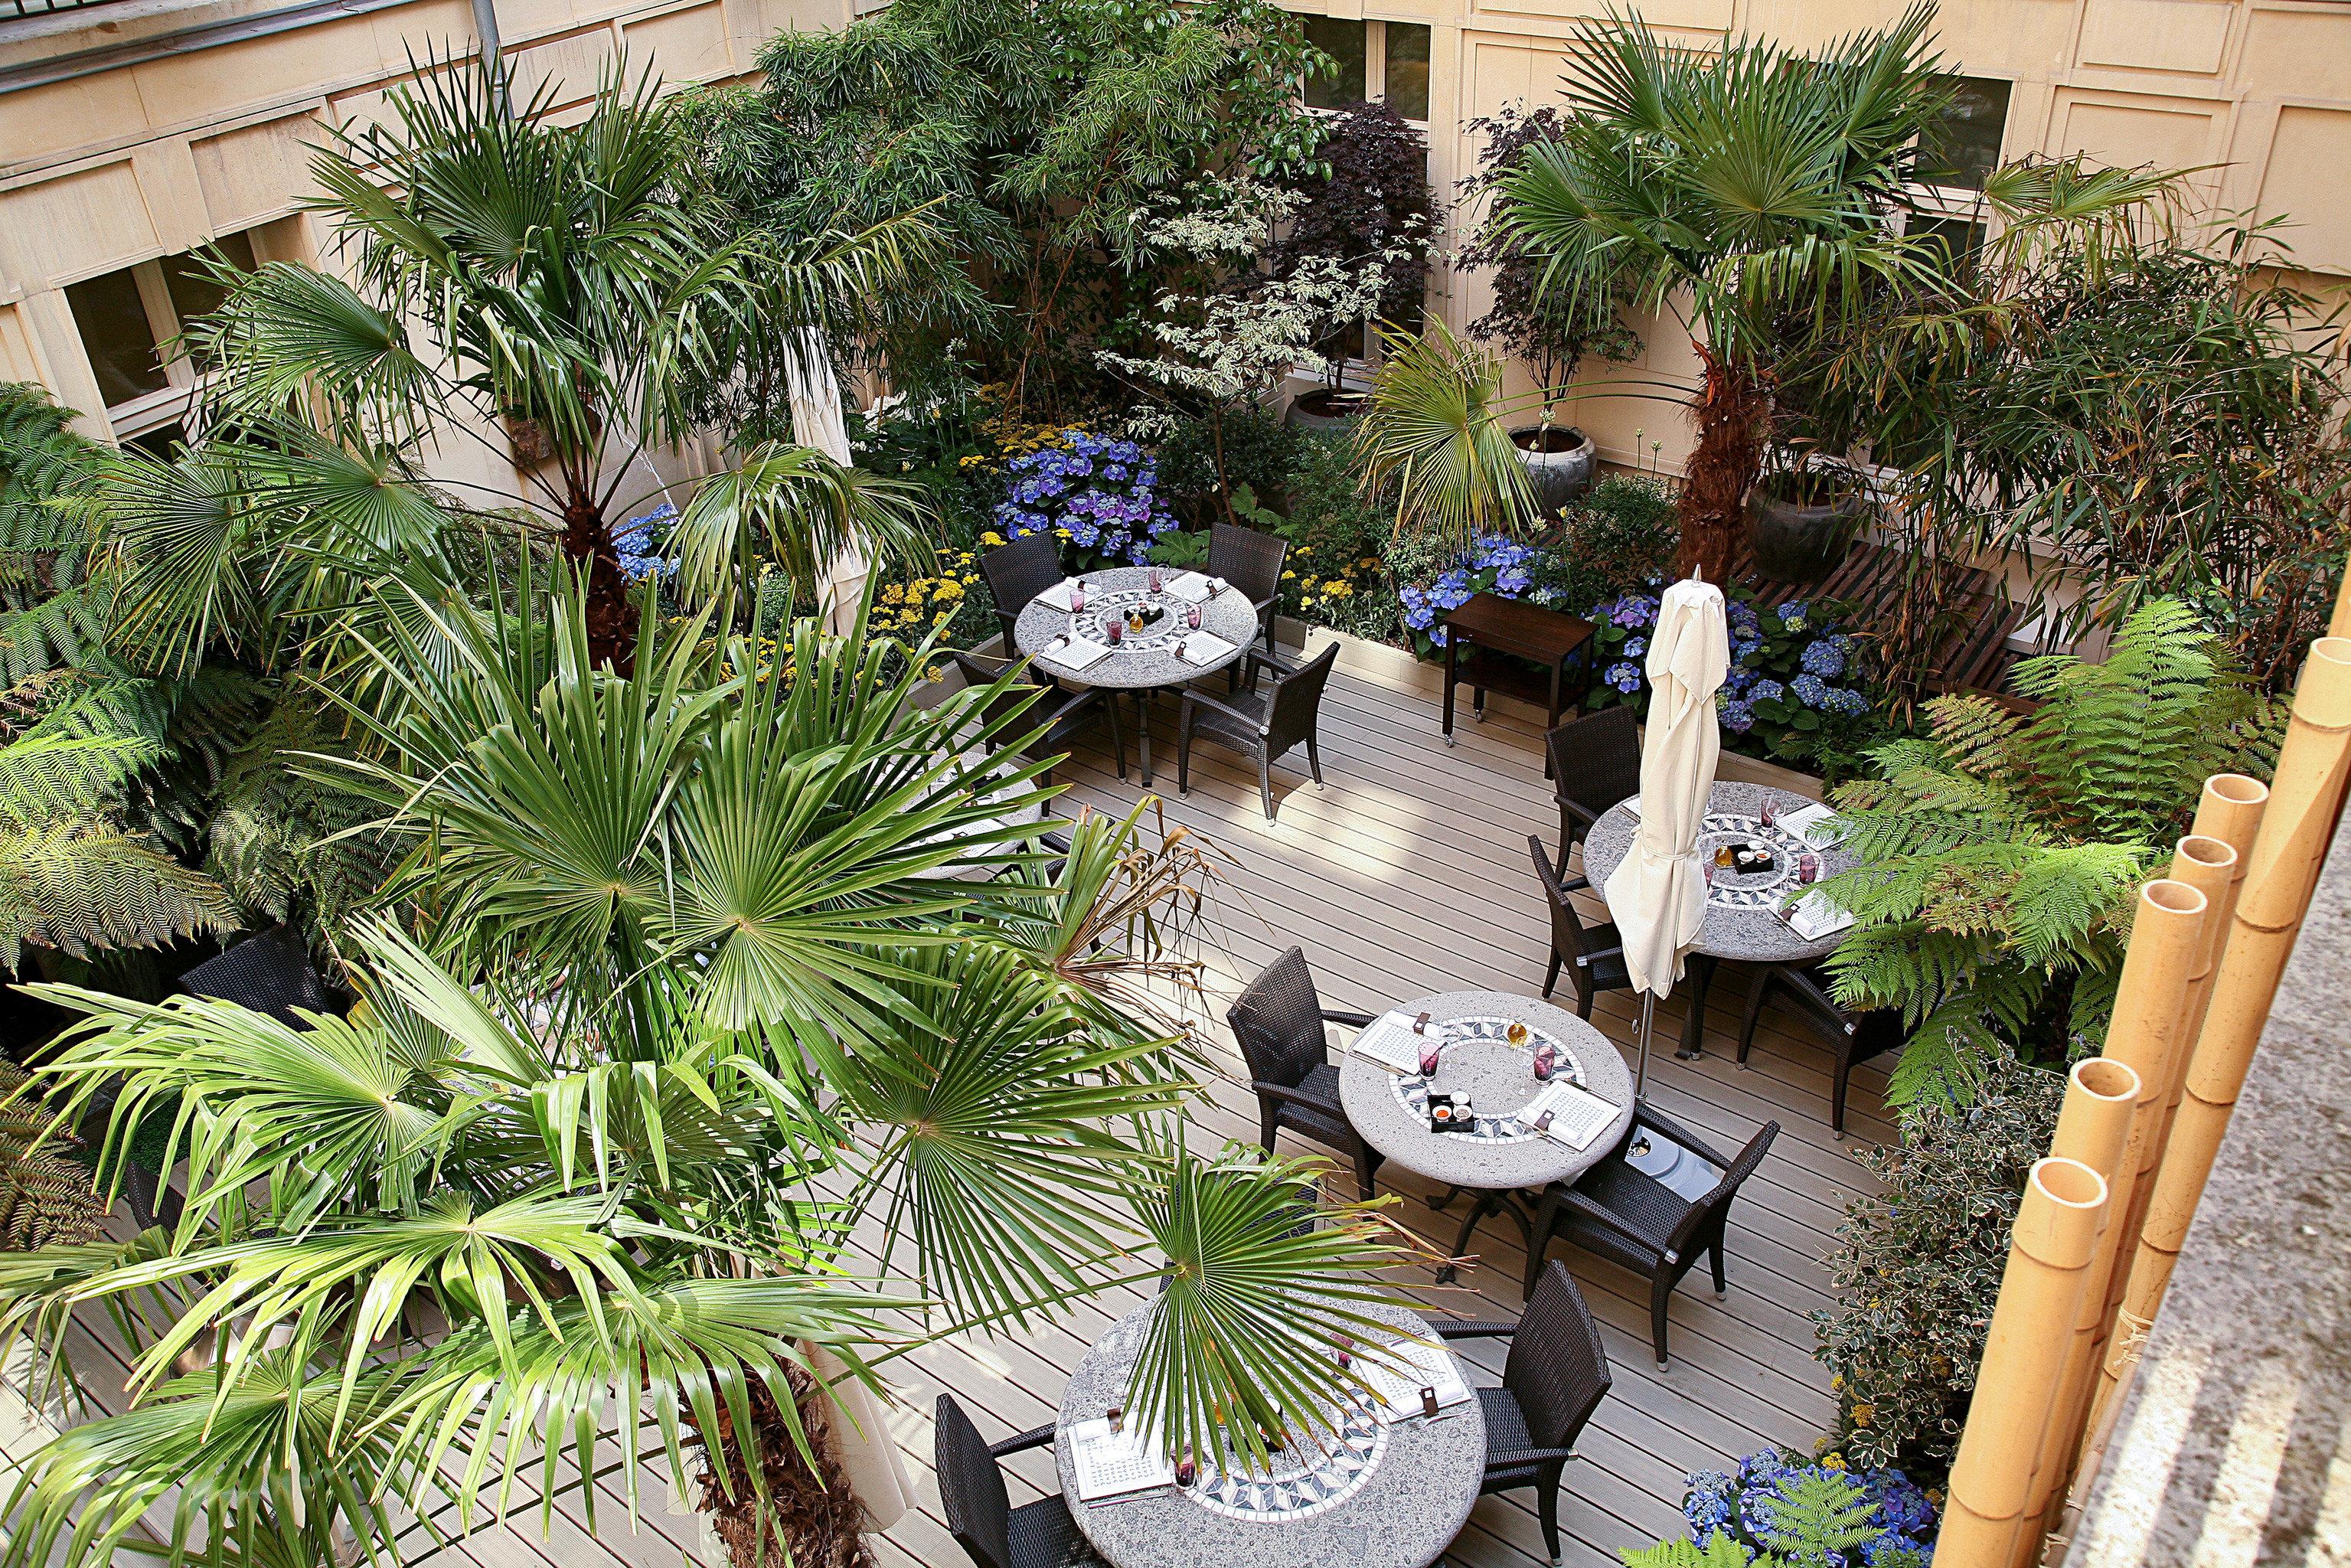 Courtyard Dining Drink Eat Elegant Lounge Luxury Modern Patio Terrace tree plant Garden botany yard backyard arecales home flower palm Resort landscaping arranged